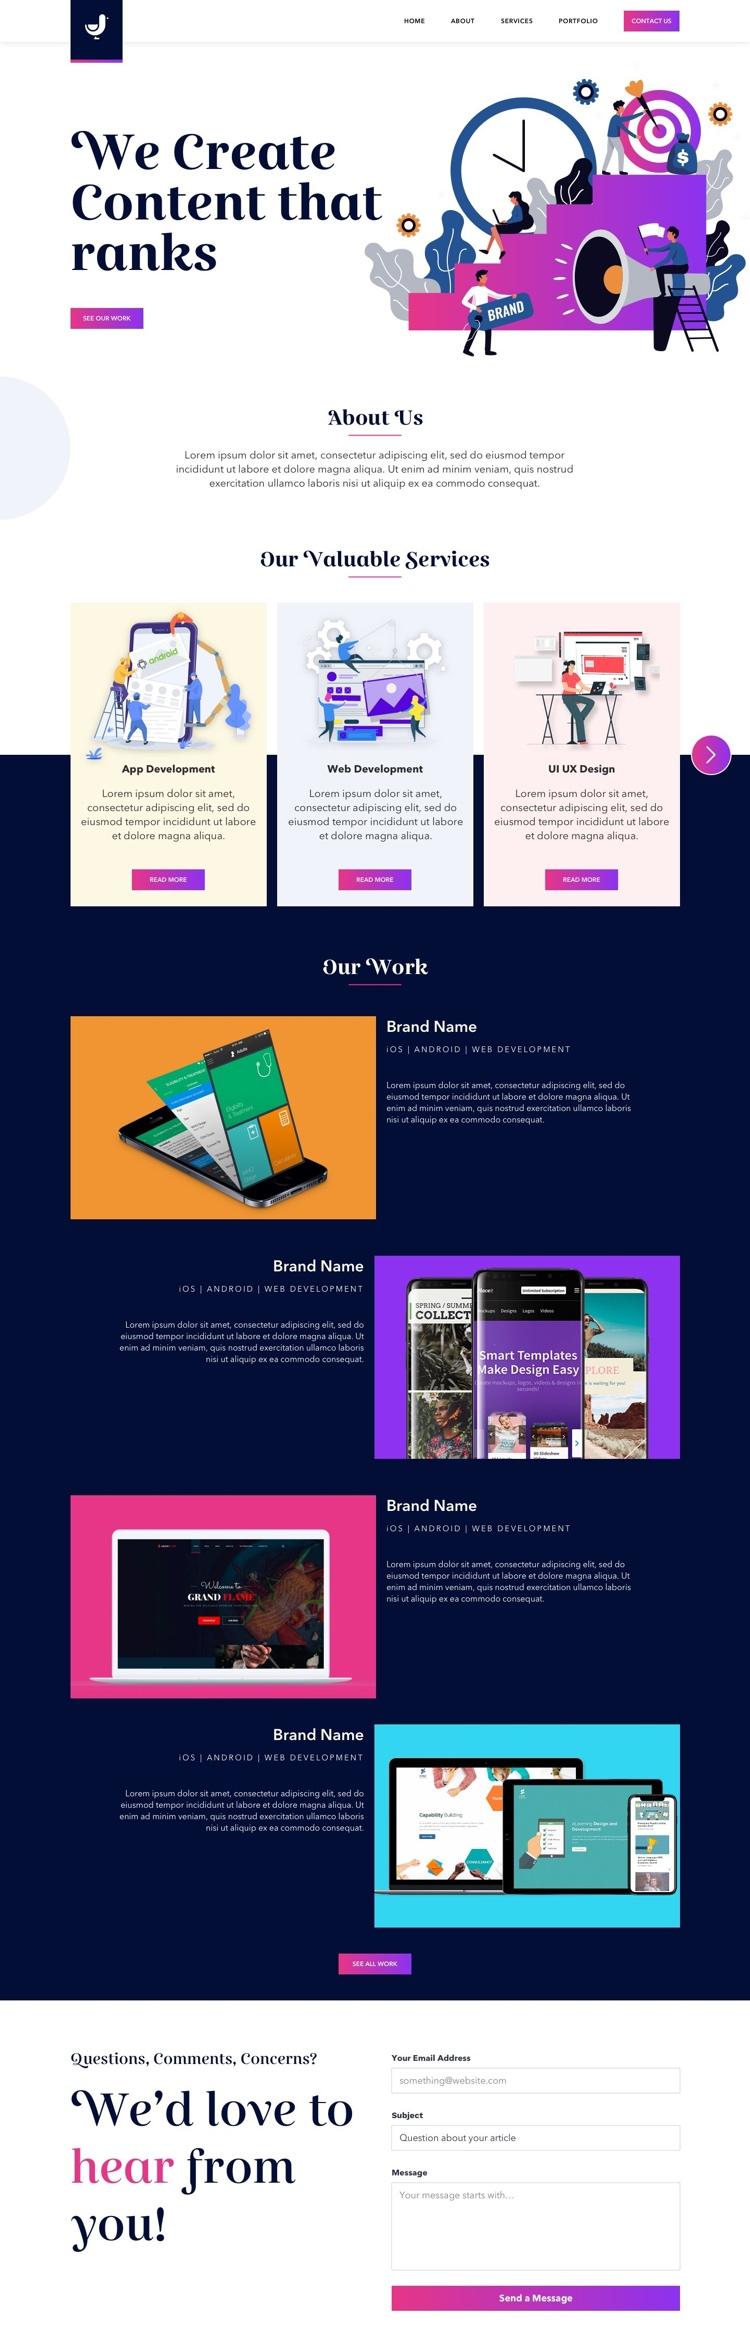 Digital Marketing Web Free 2 - UI Freebies